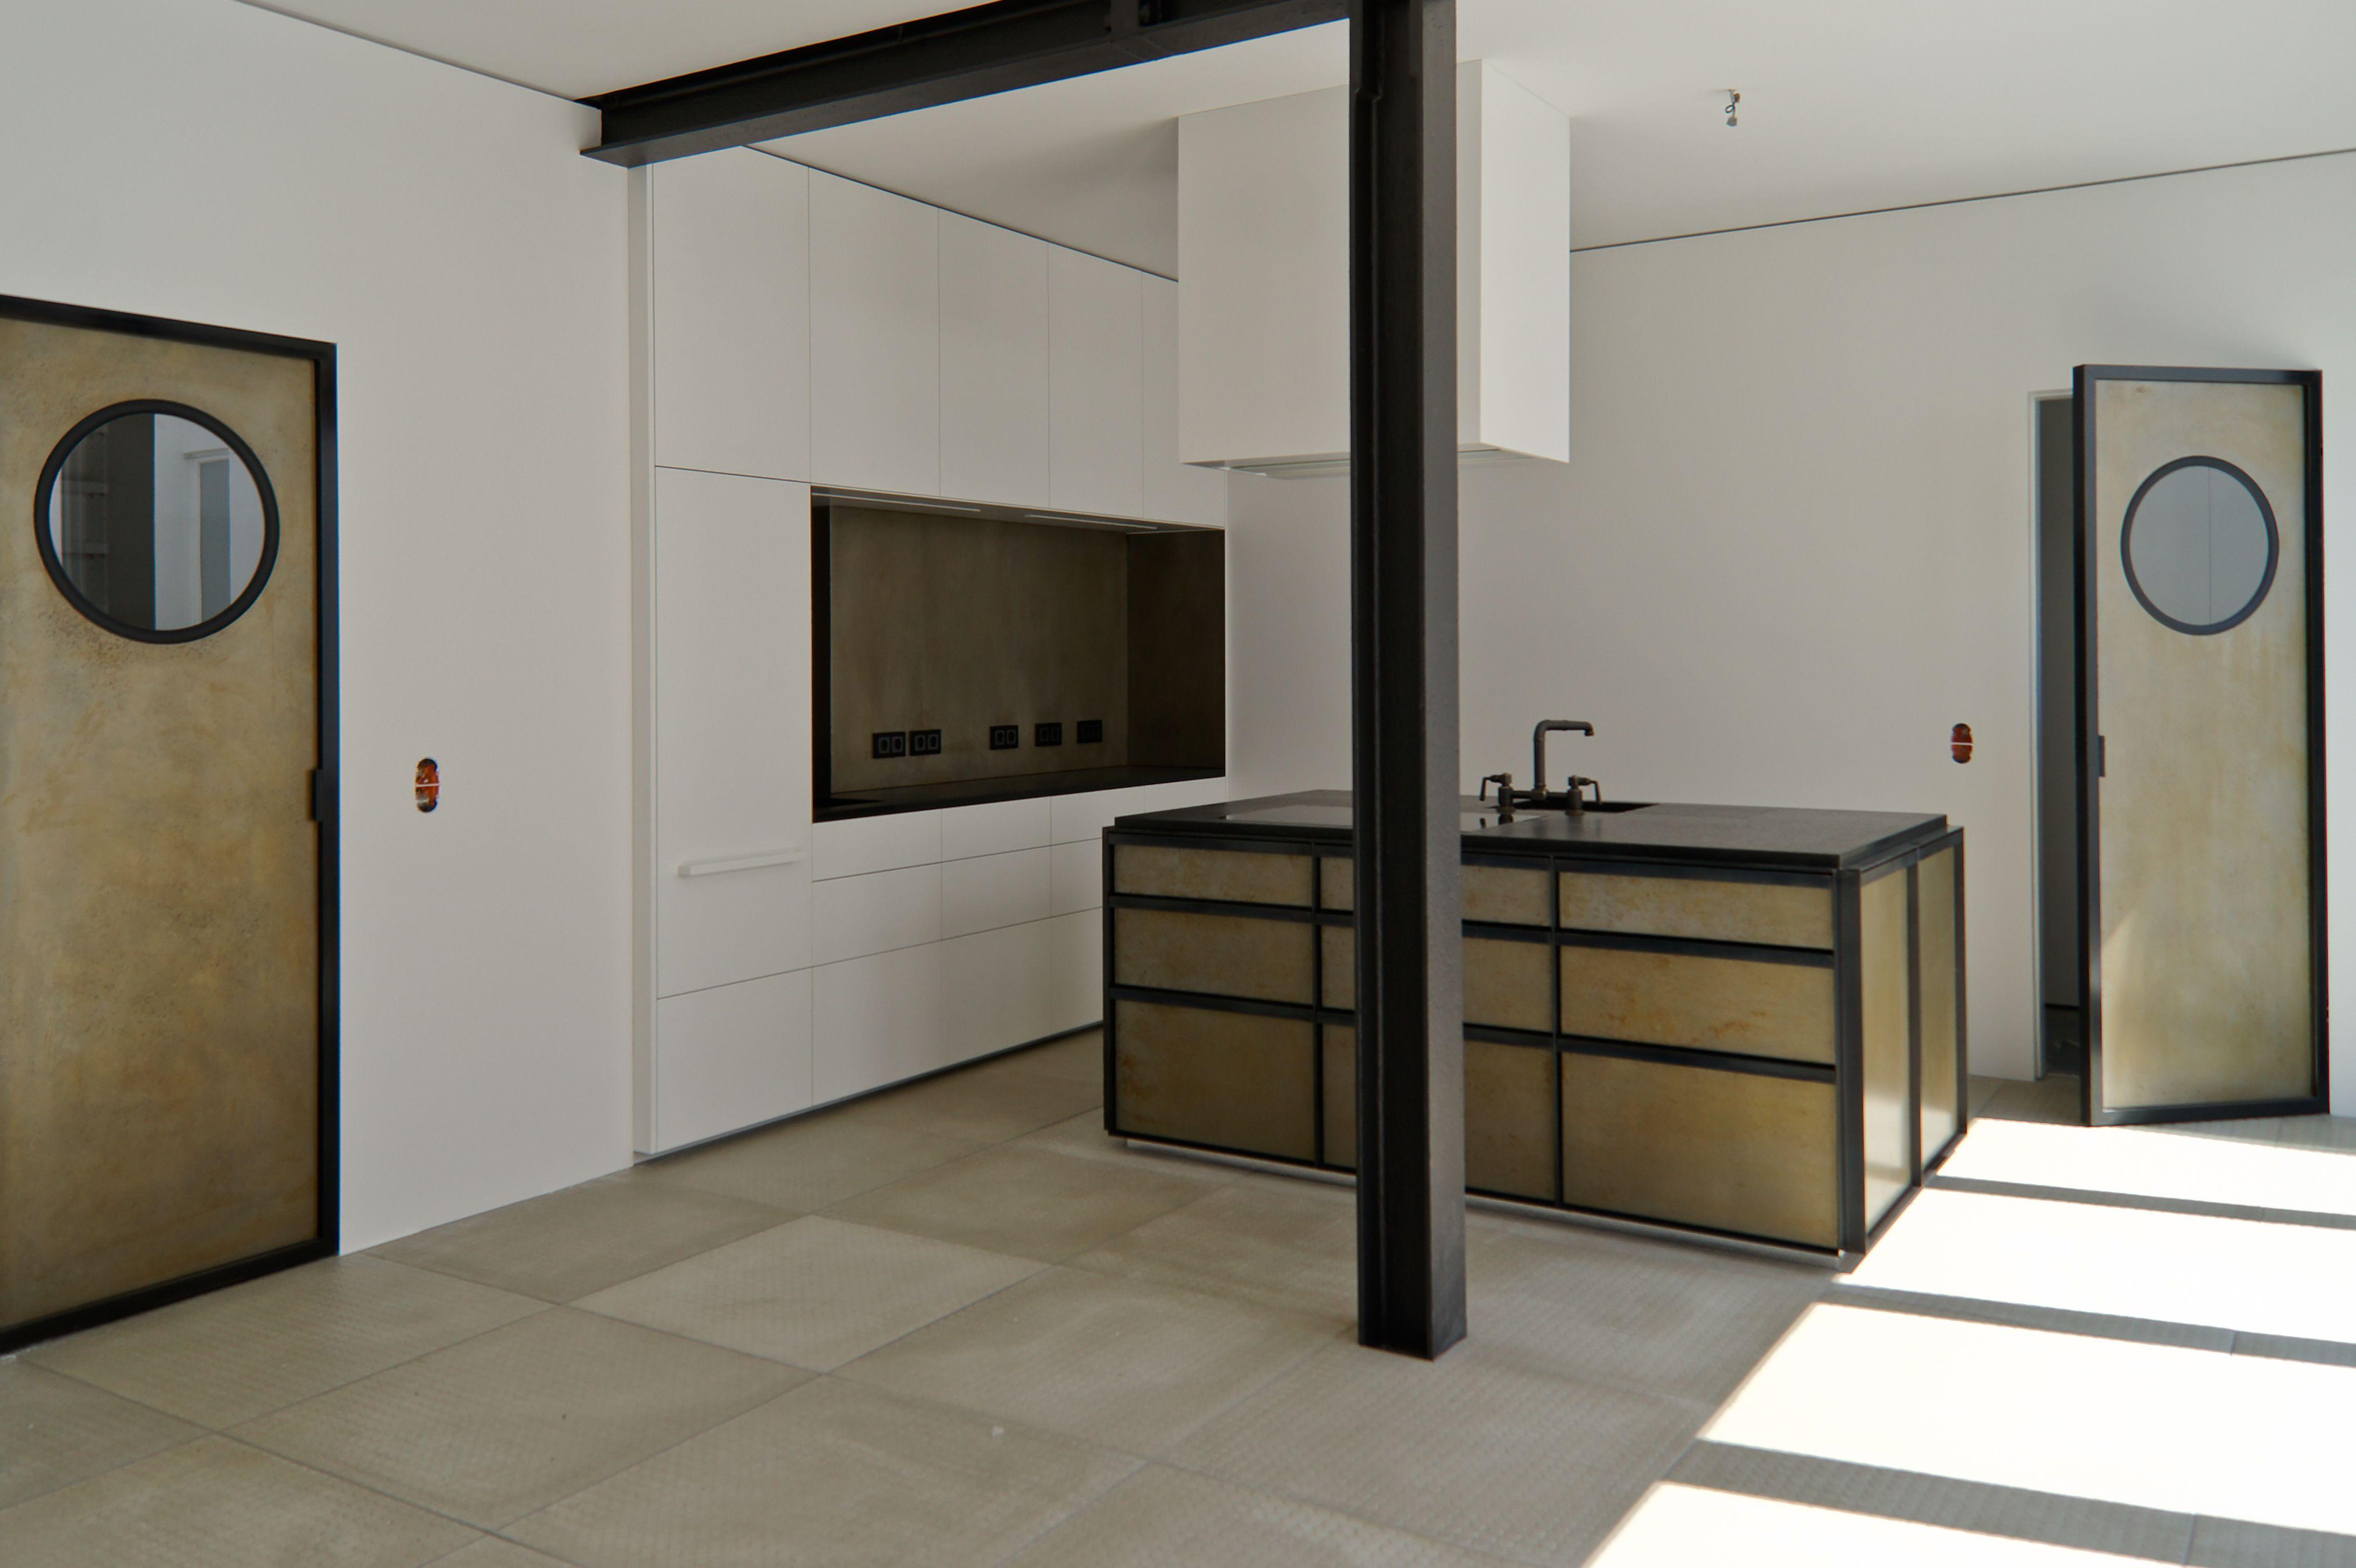 novy induktionskochfeld mit abzug kochfeld mit abzug g nstig kaufen ebay novy. Black Bedroom Furniture Sets. Home Design Ideas